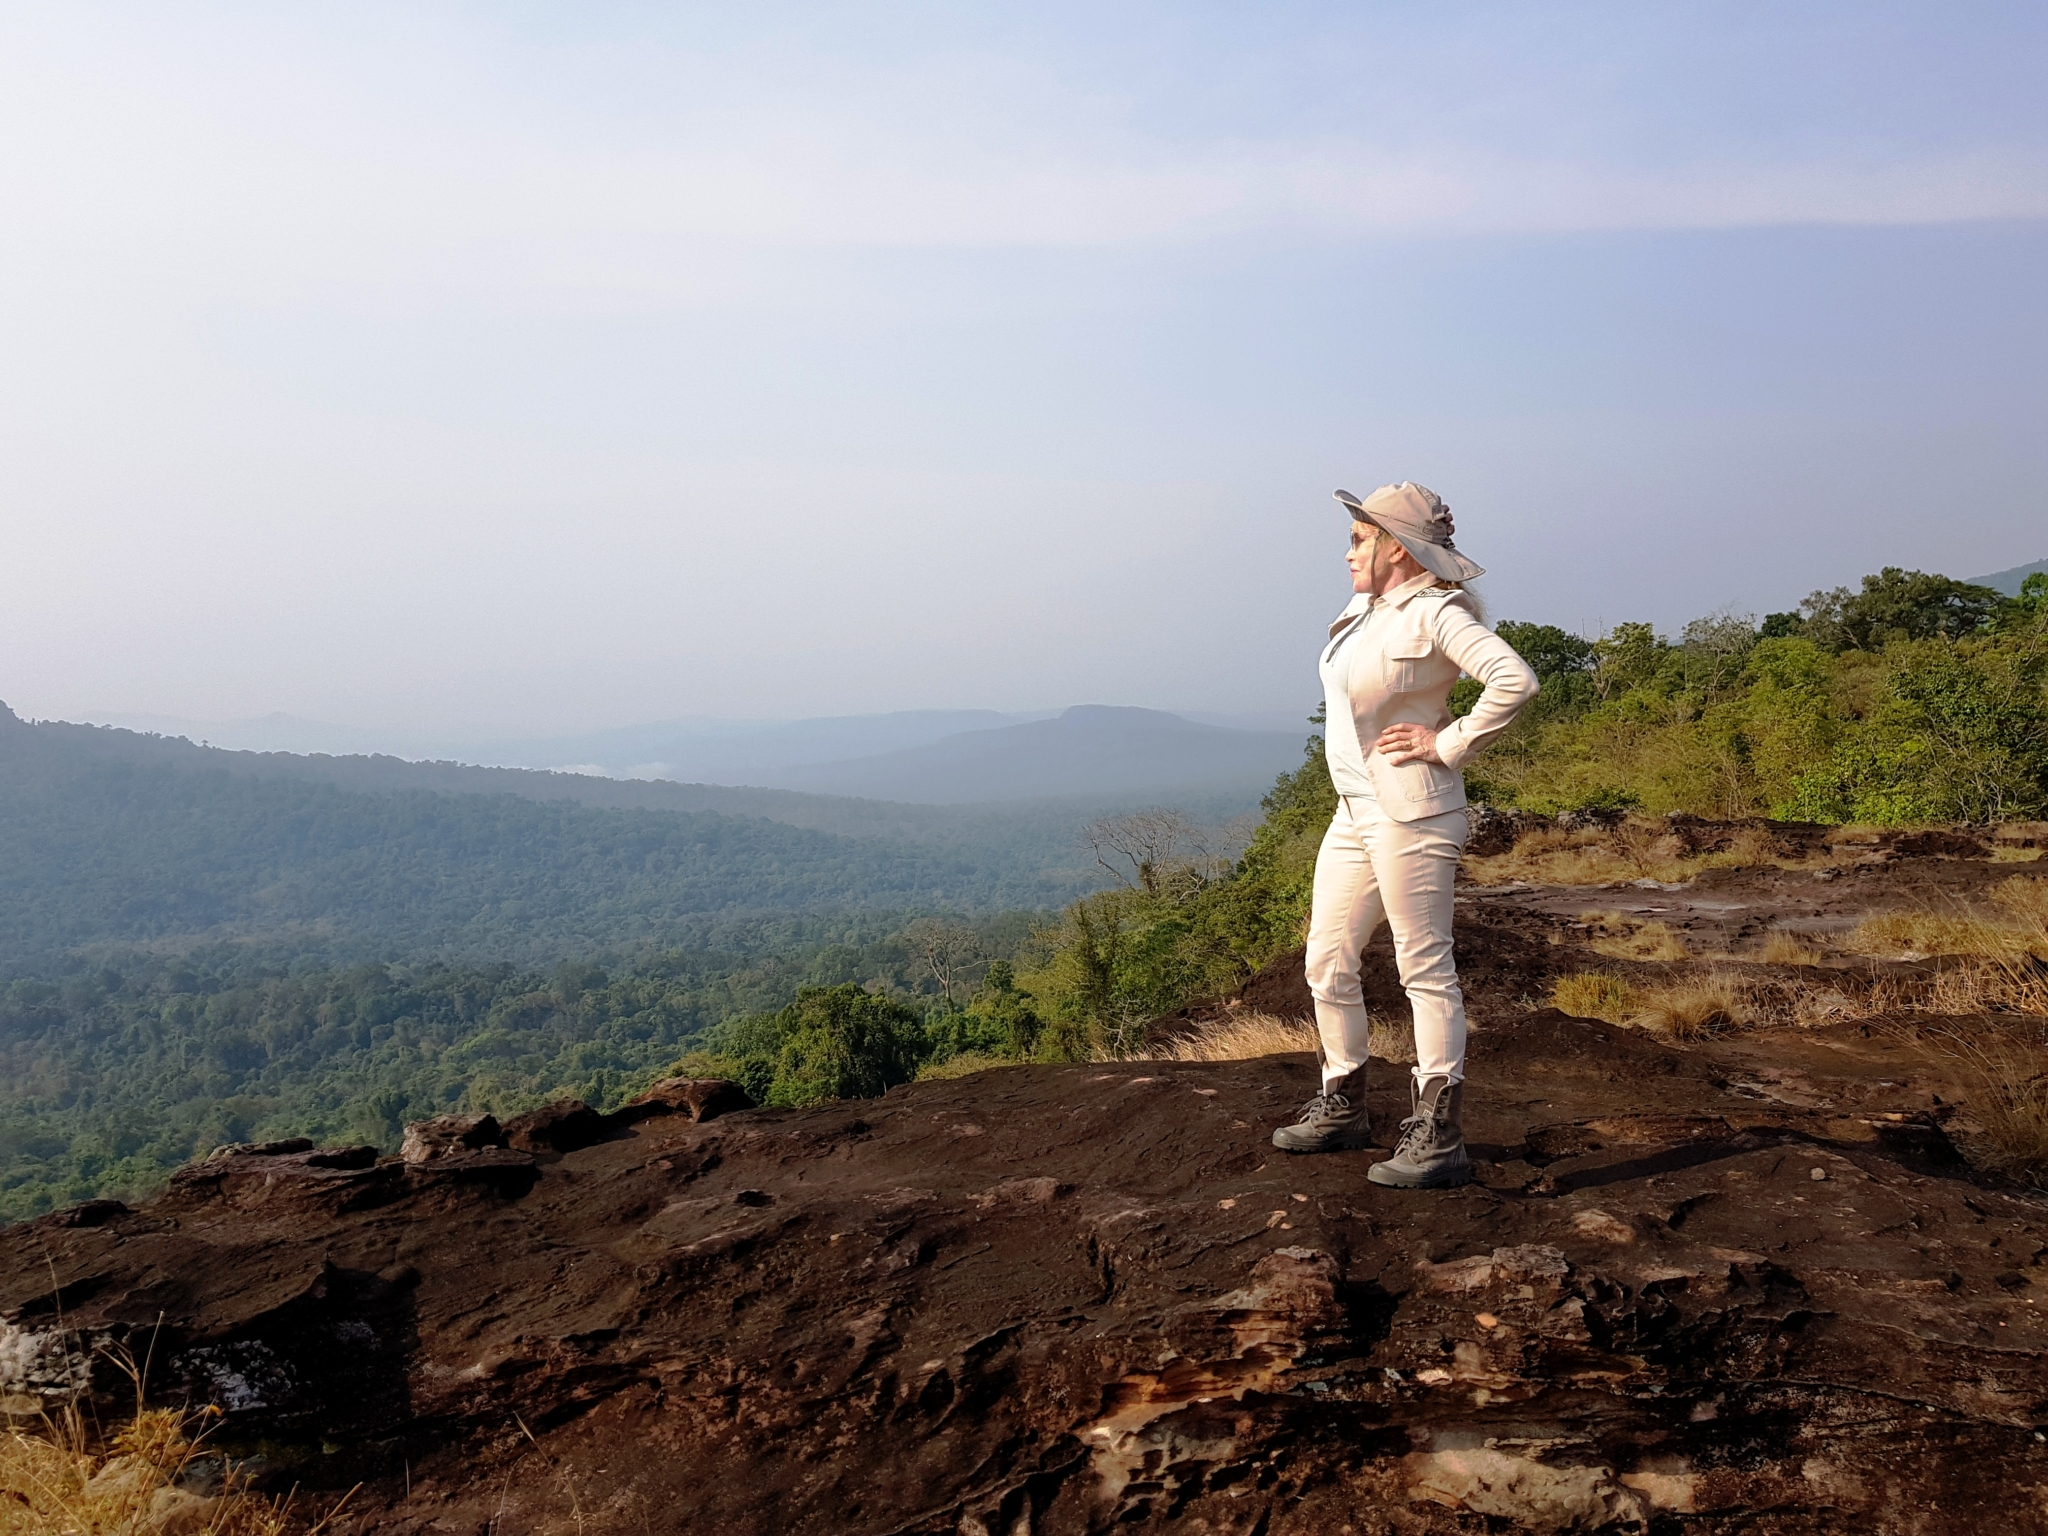 wildlife alliance Wildlife Alliance Founder and CEO, Suwanna Gauntlett visit at Shinta Mani Wild Suwanna Gauntlett Cardamom Mountain